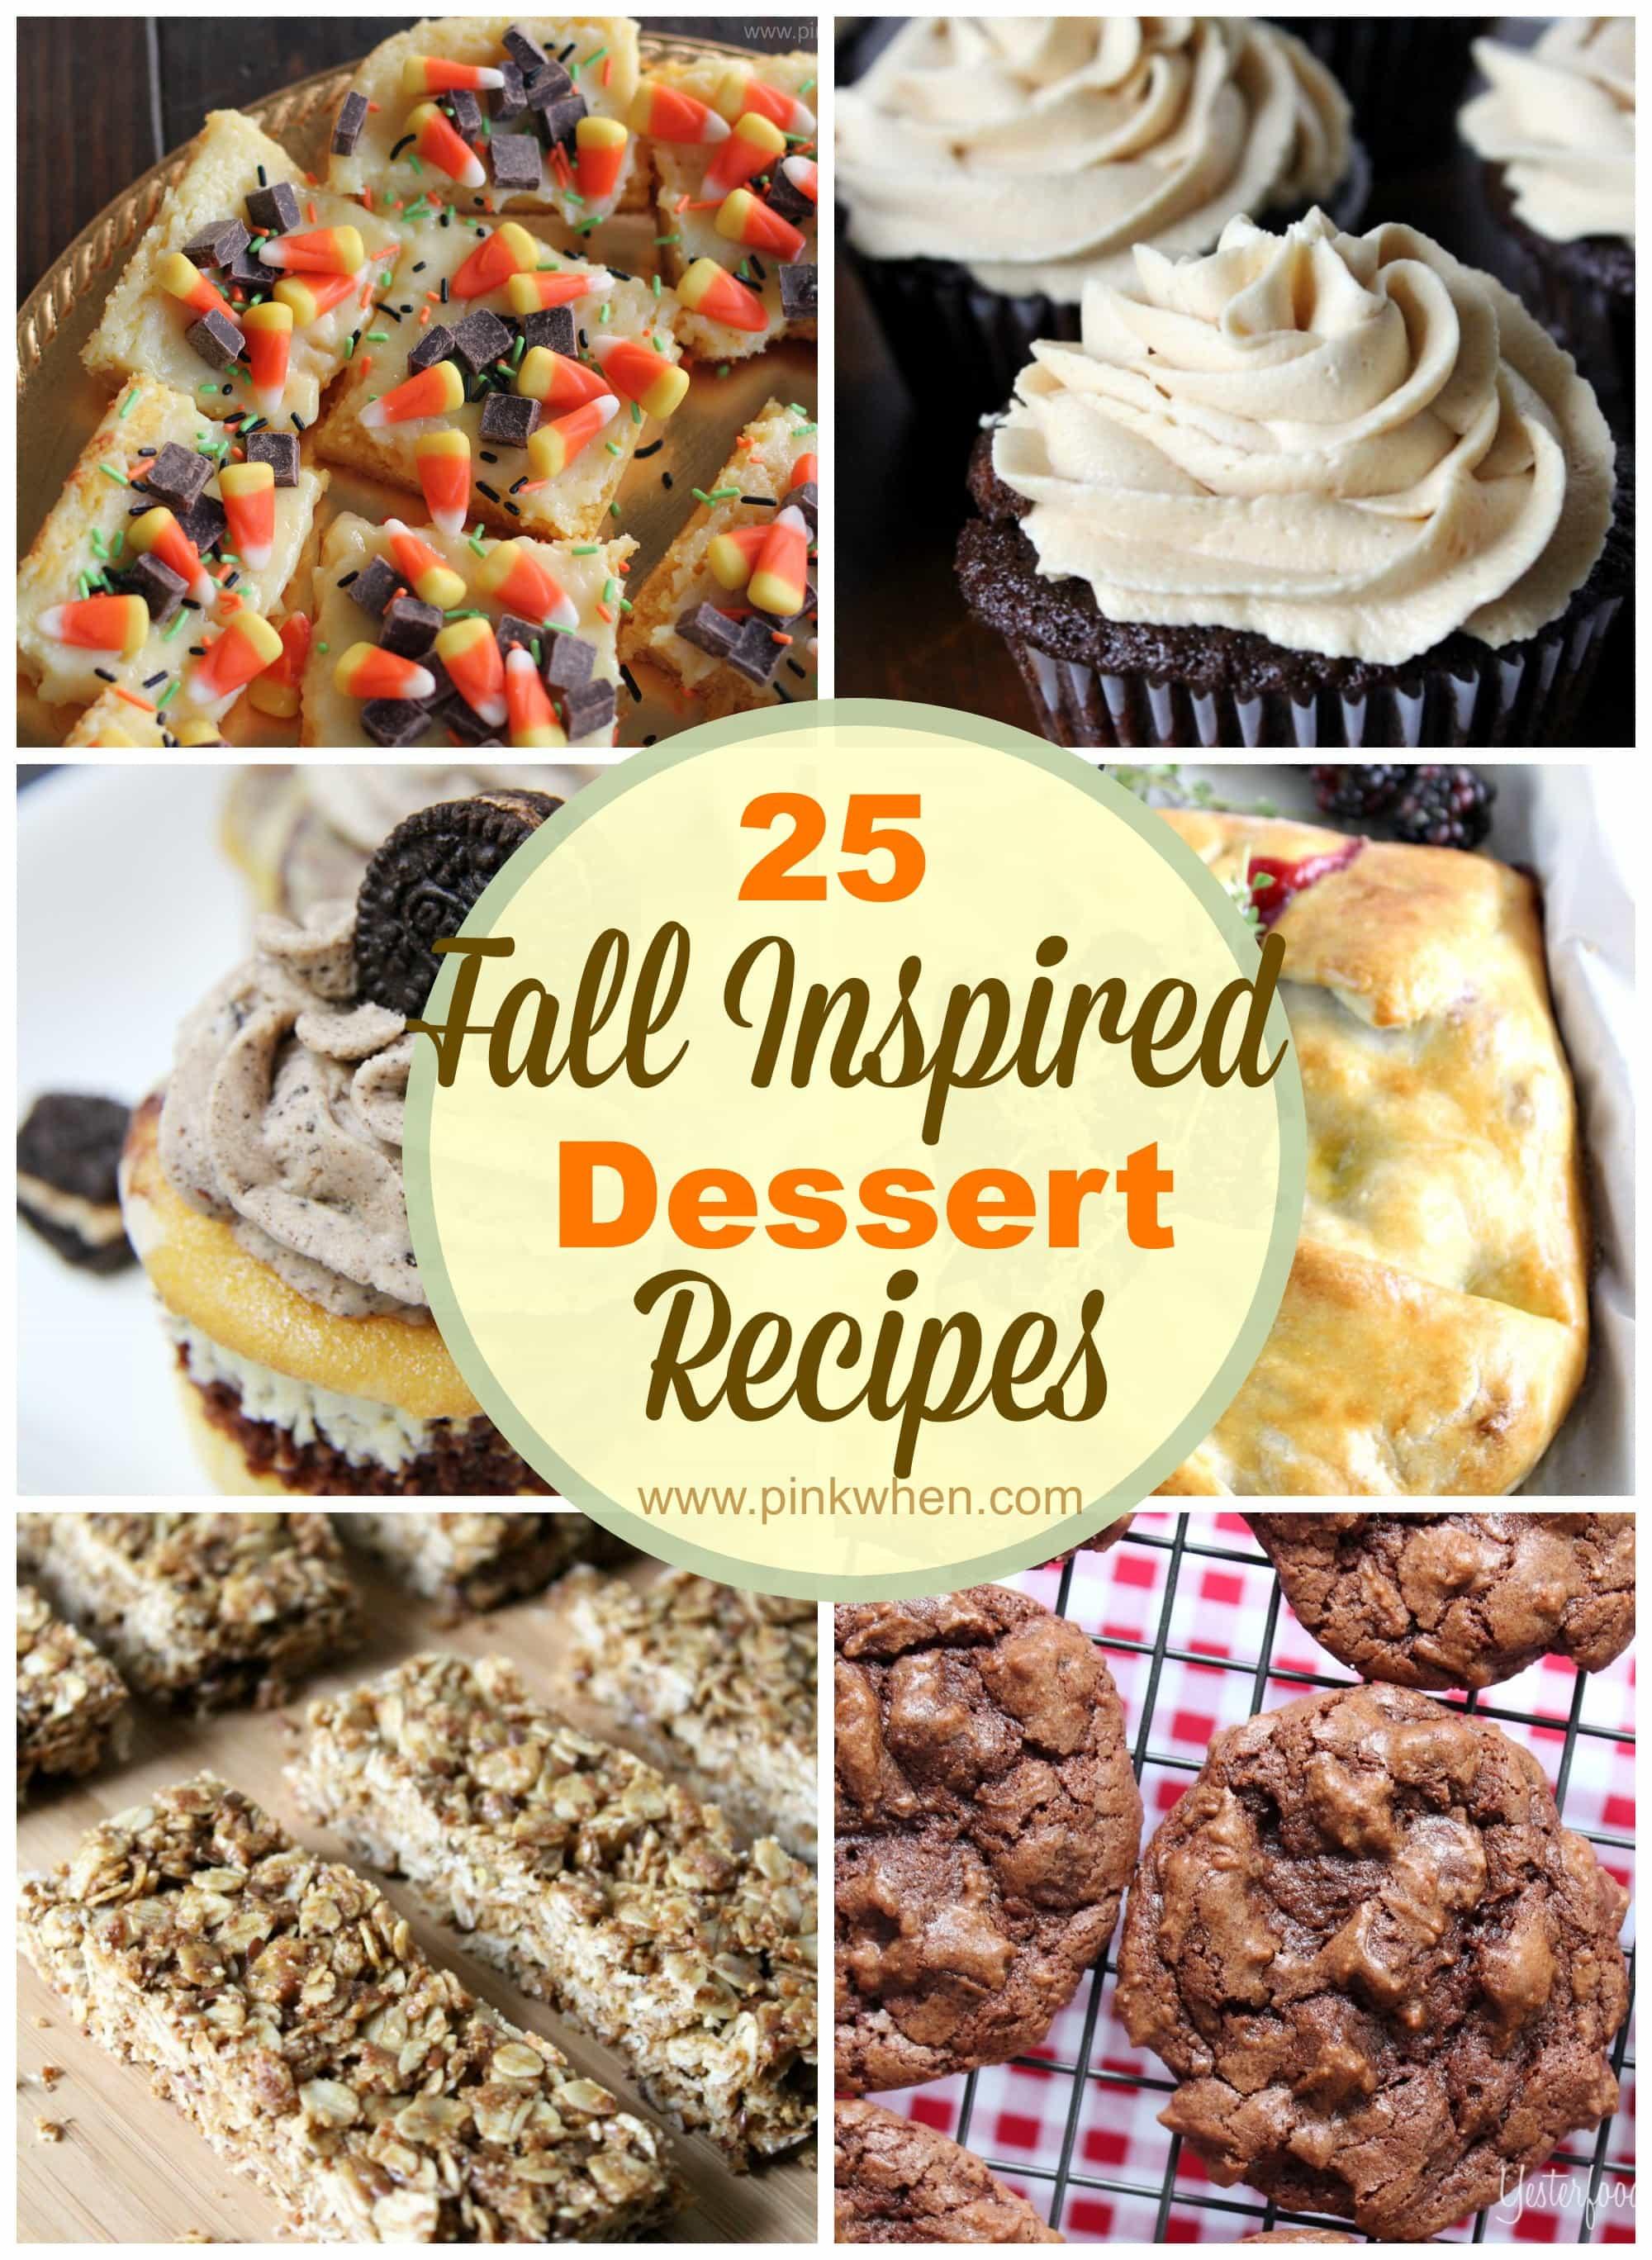 Fun Fall Desserts  diy Sunday Showcase 9 27 & FAVS PinkWhen